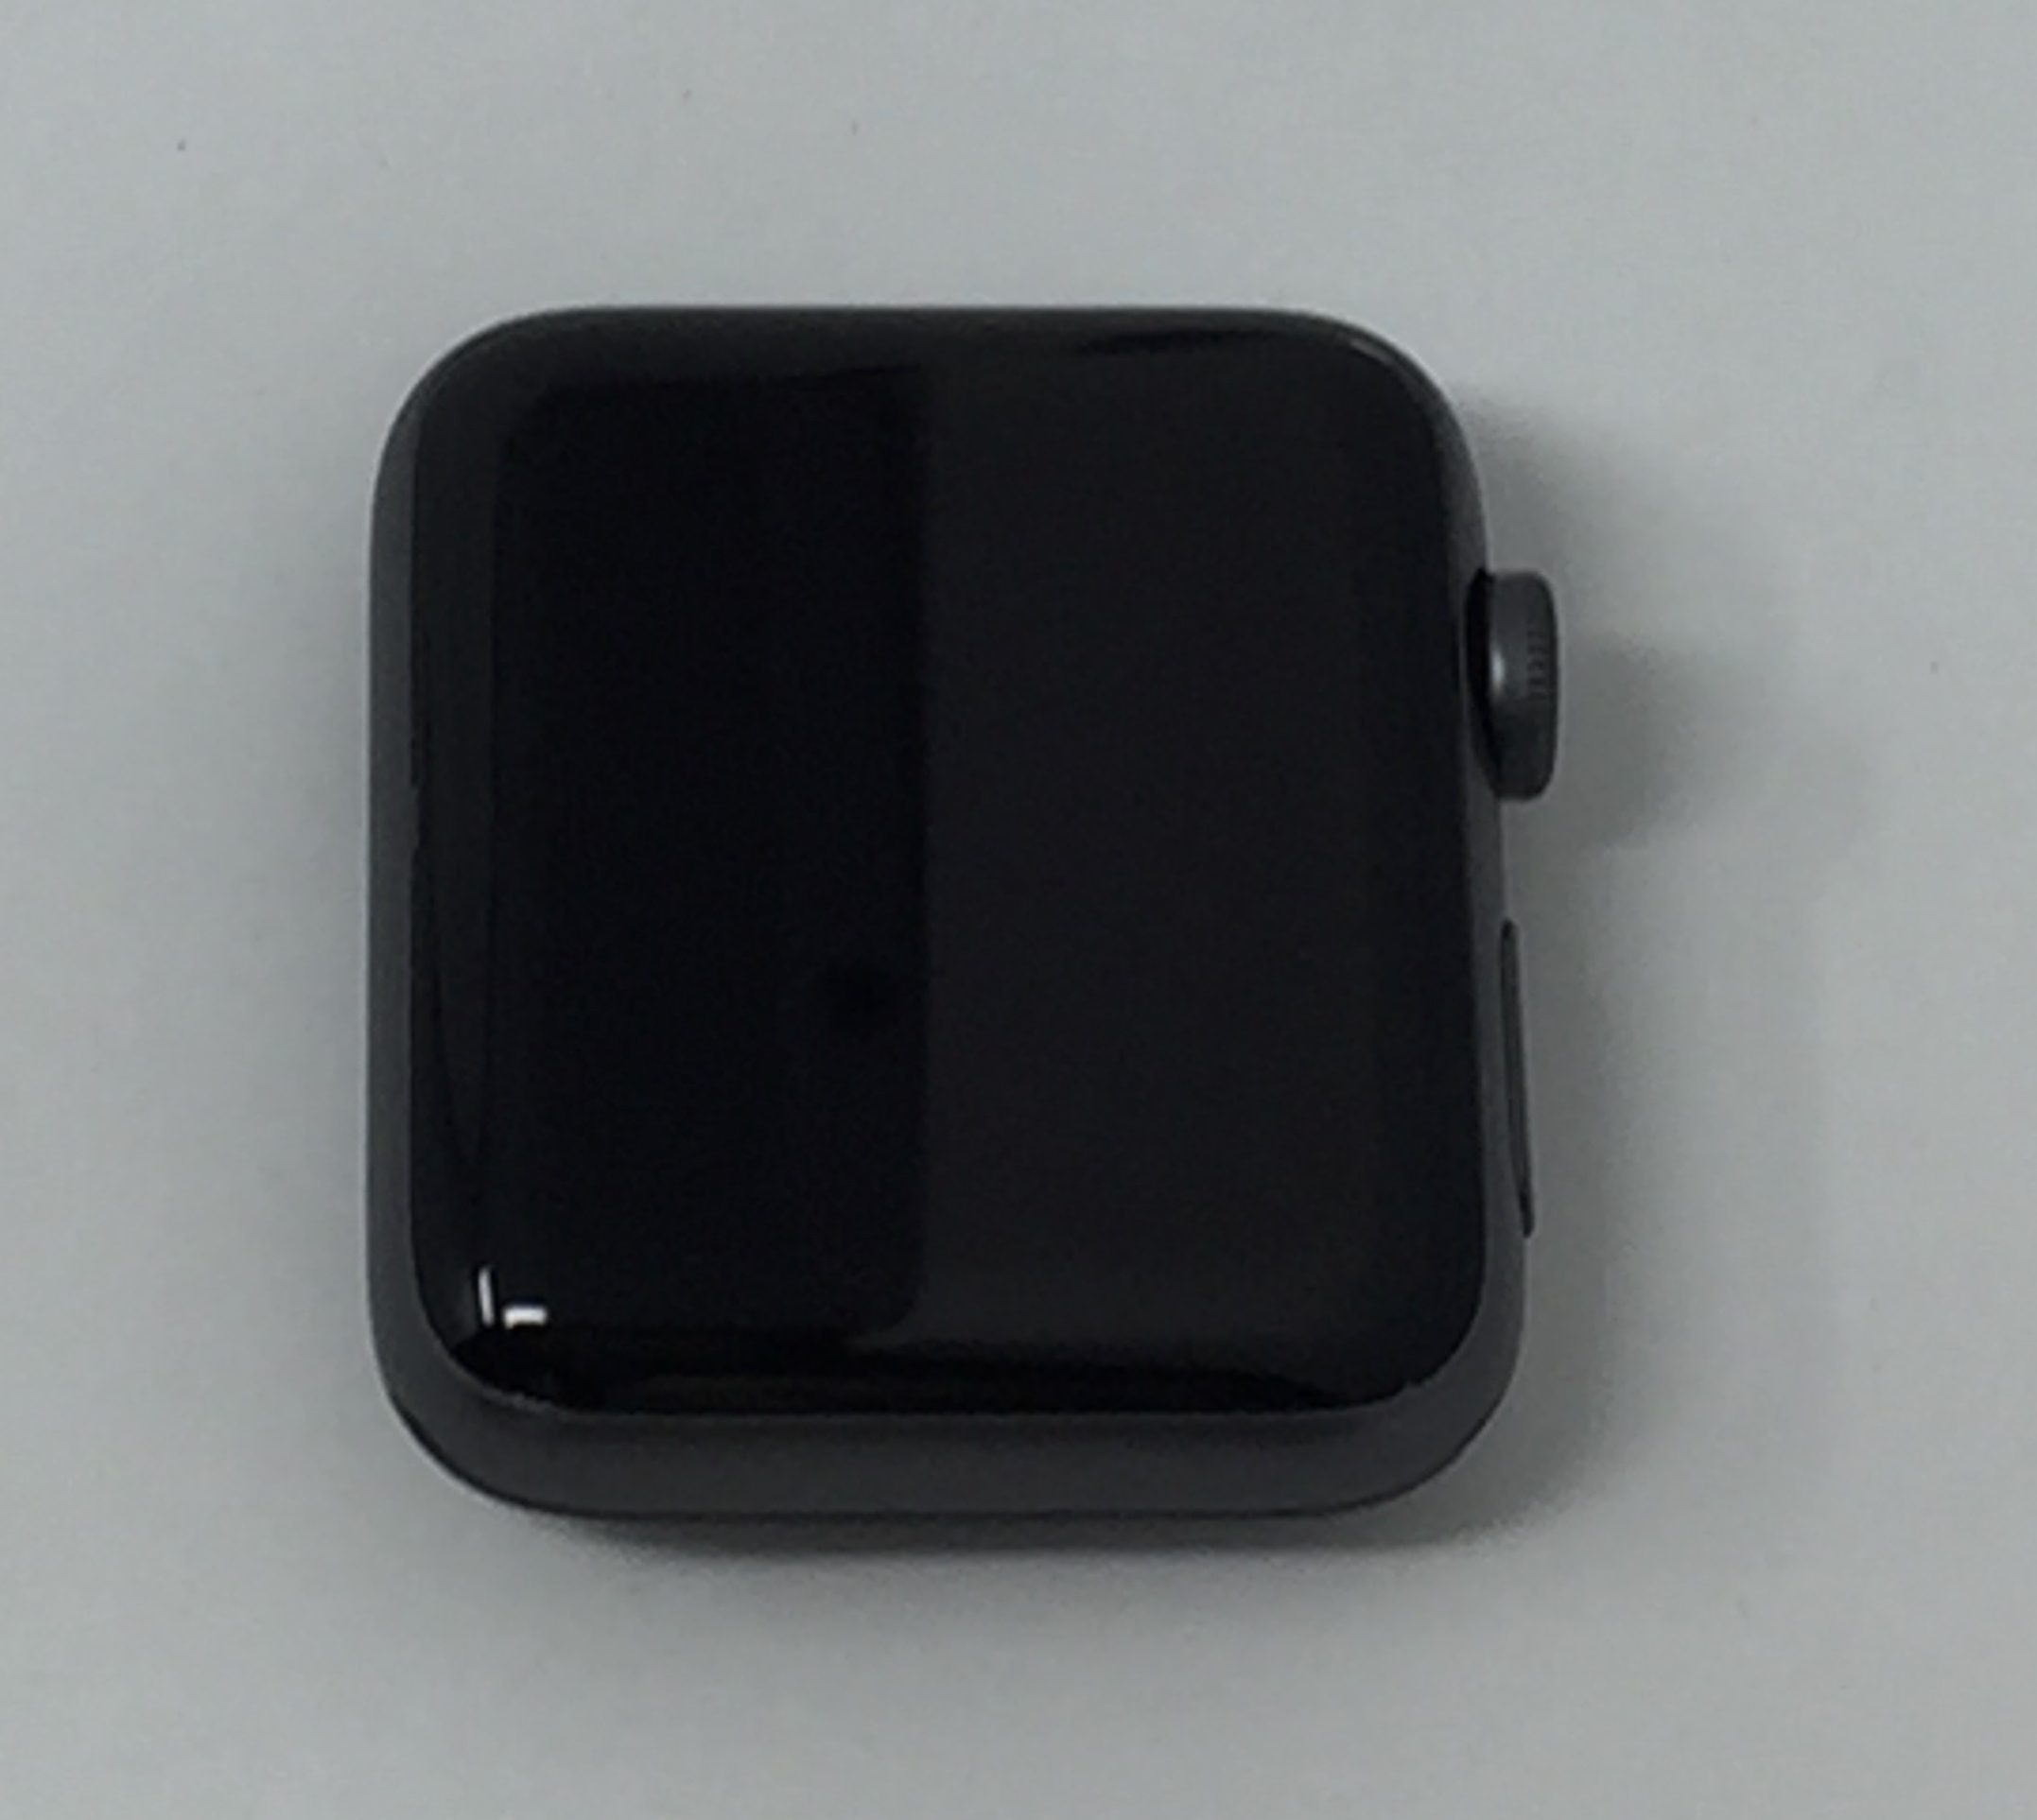 Watch Series 2 Aluminum (42mm), Silver, Kuva 1